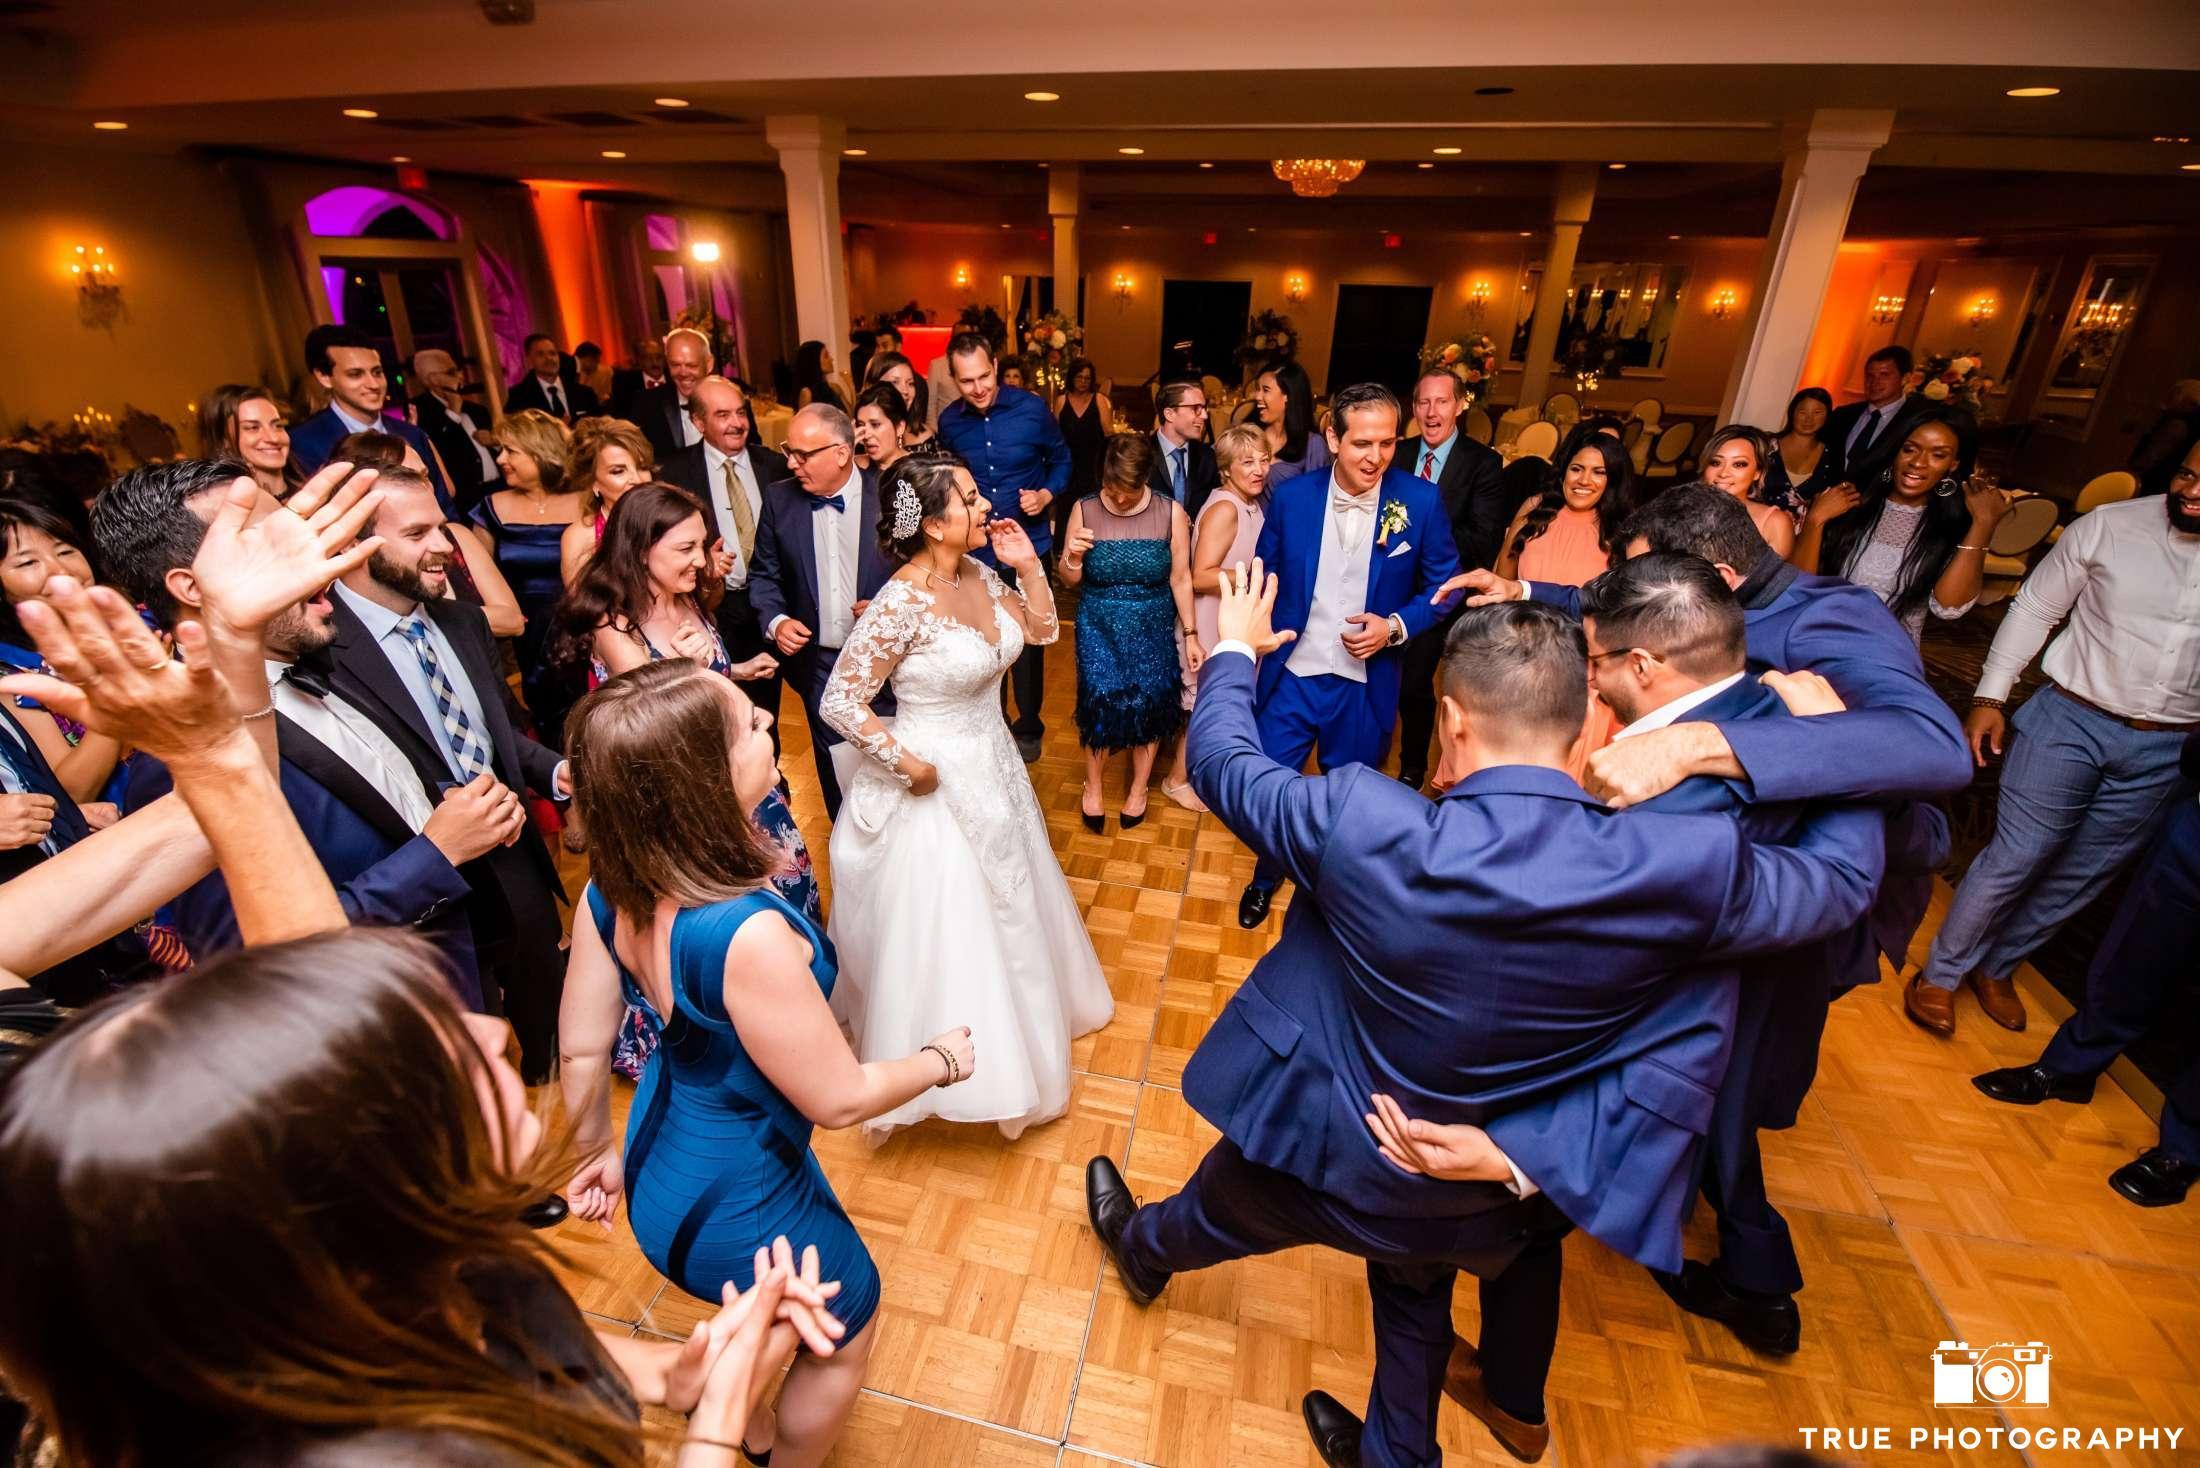 Professional DJ for weddings - Becks Entertainment